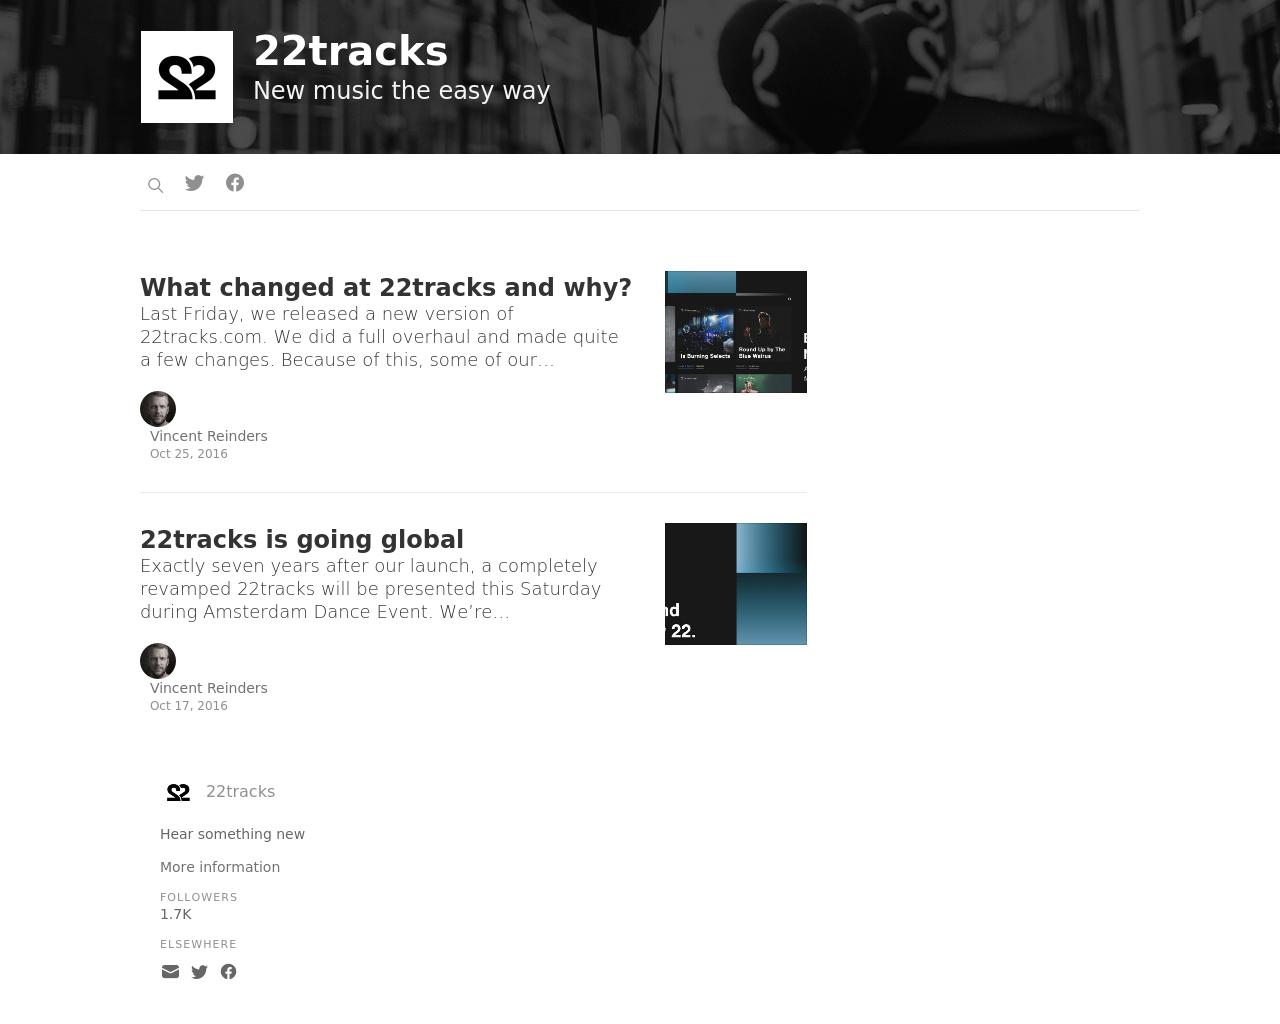 22TRACKS-Advertising-Reviews-Pricing